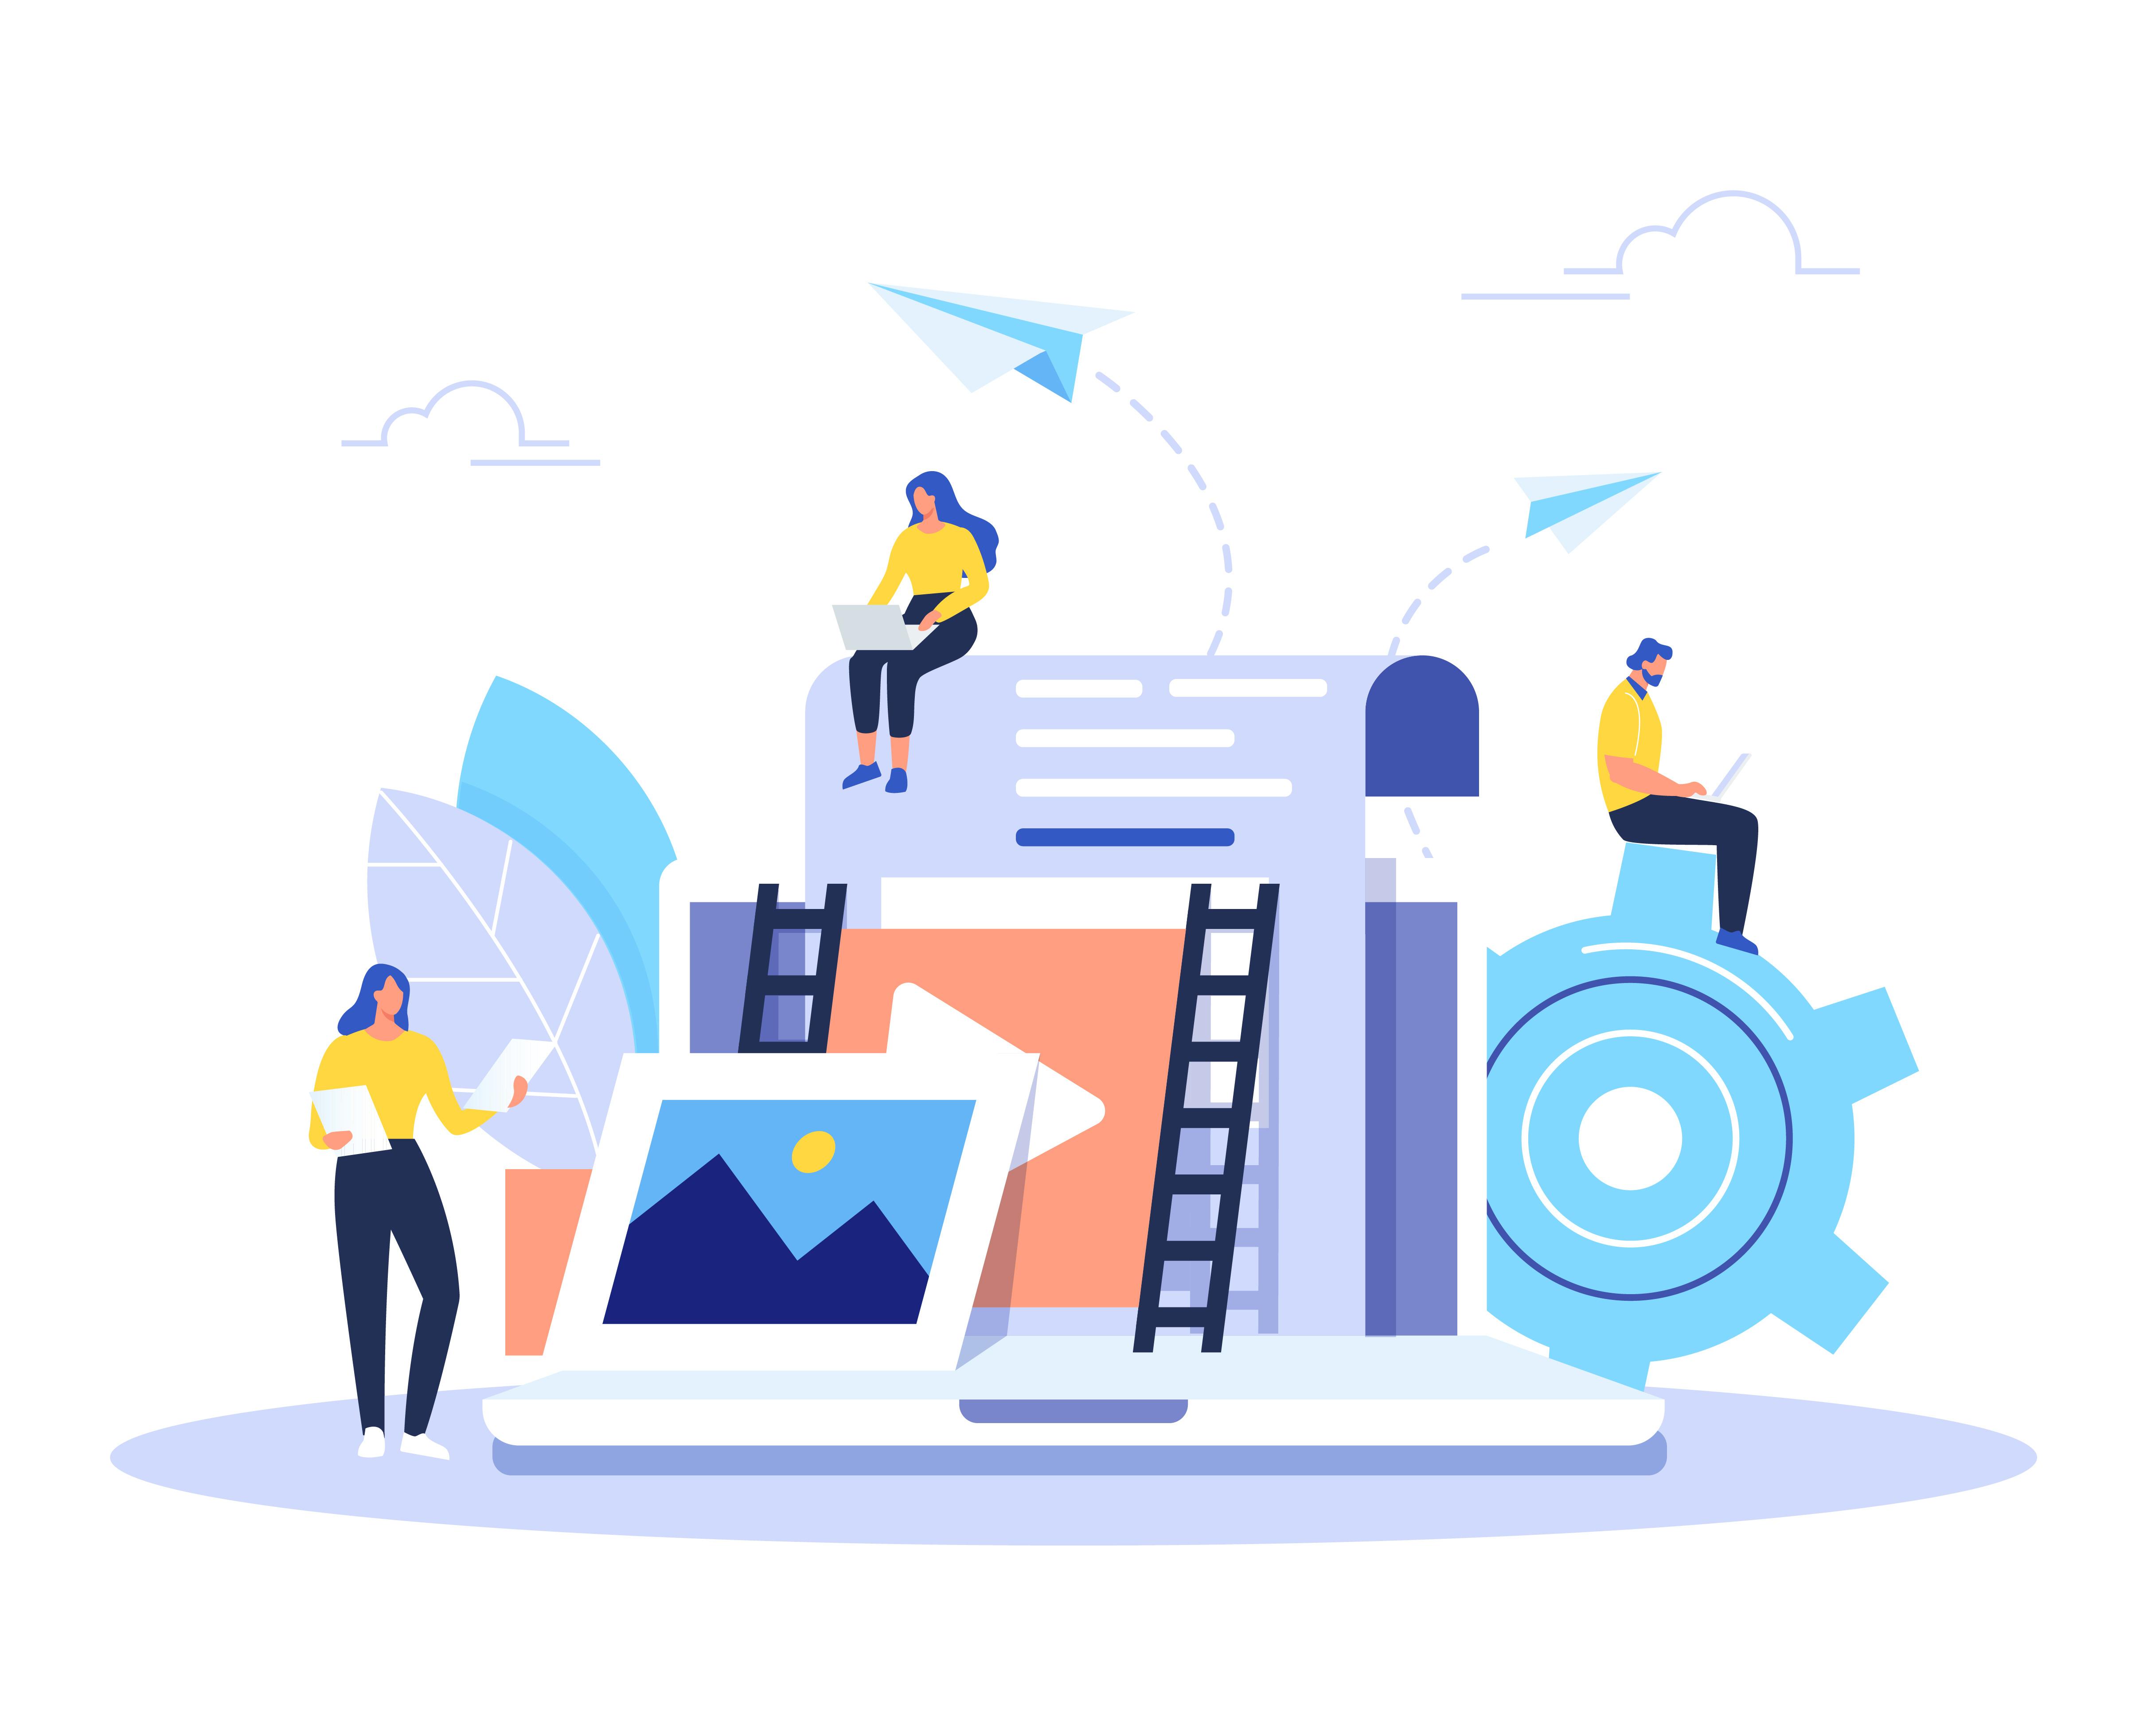 BtoBの中小企業やスタートアップがWebにチャネルを構築するノウハウ